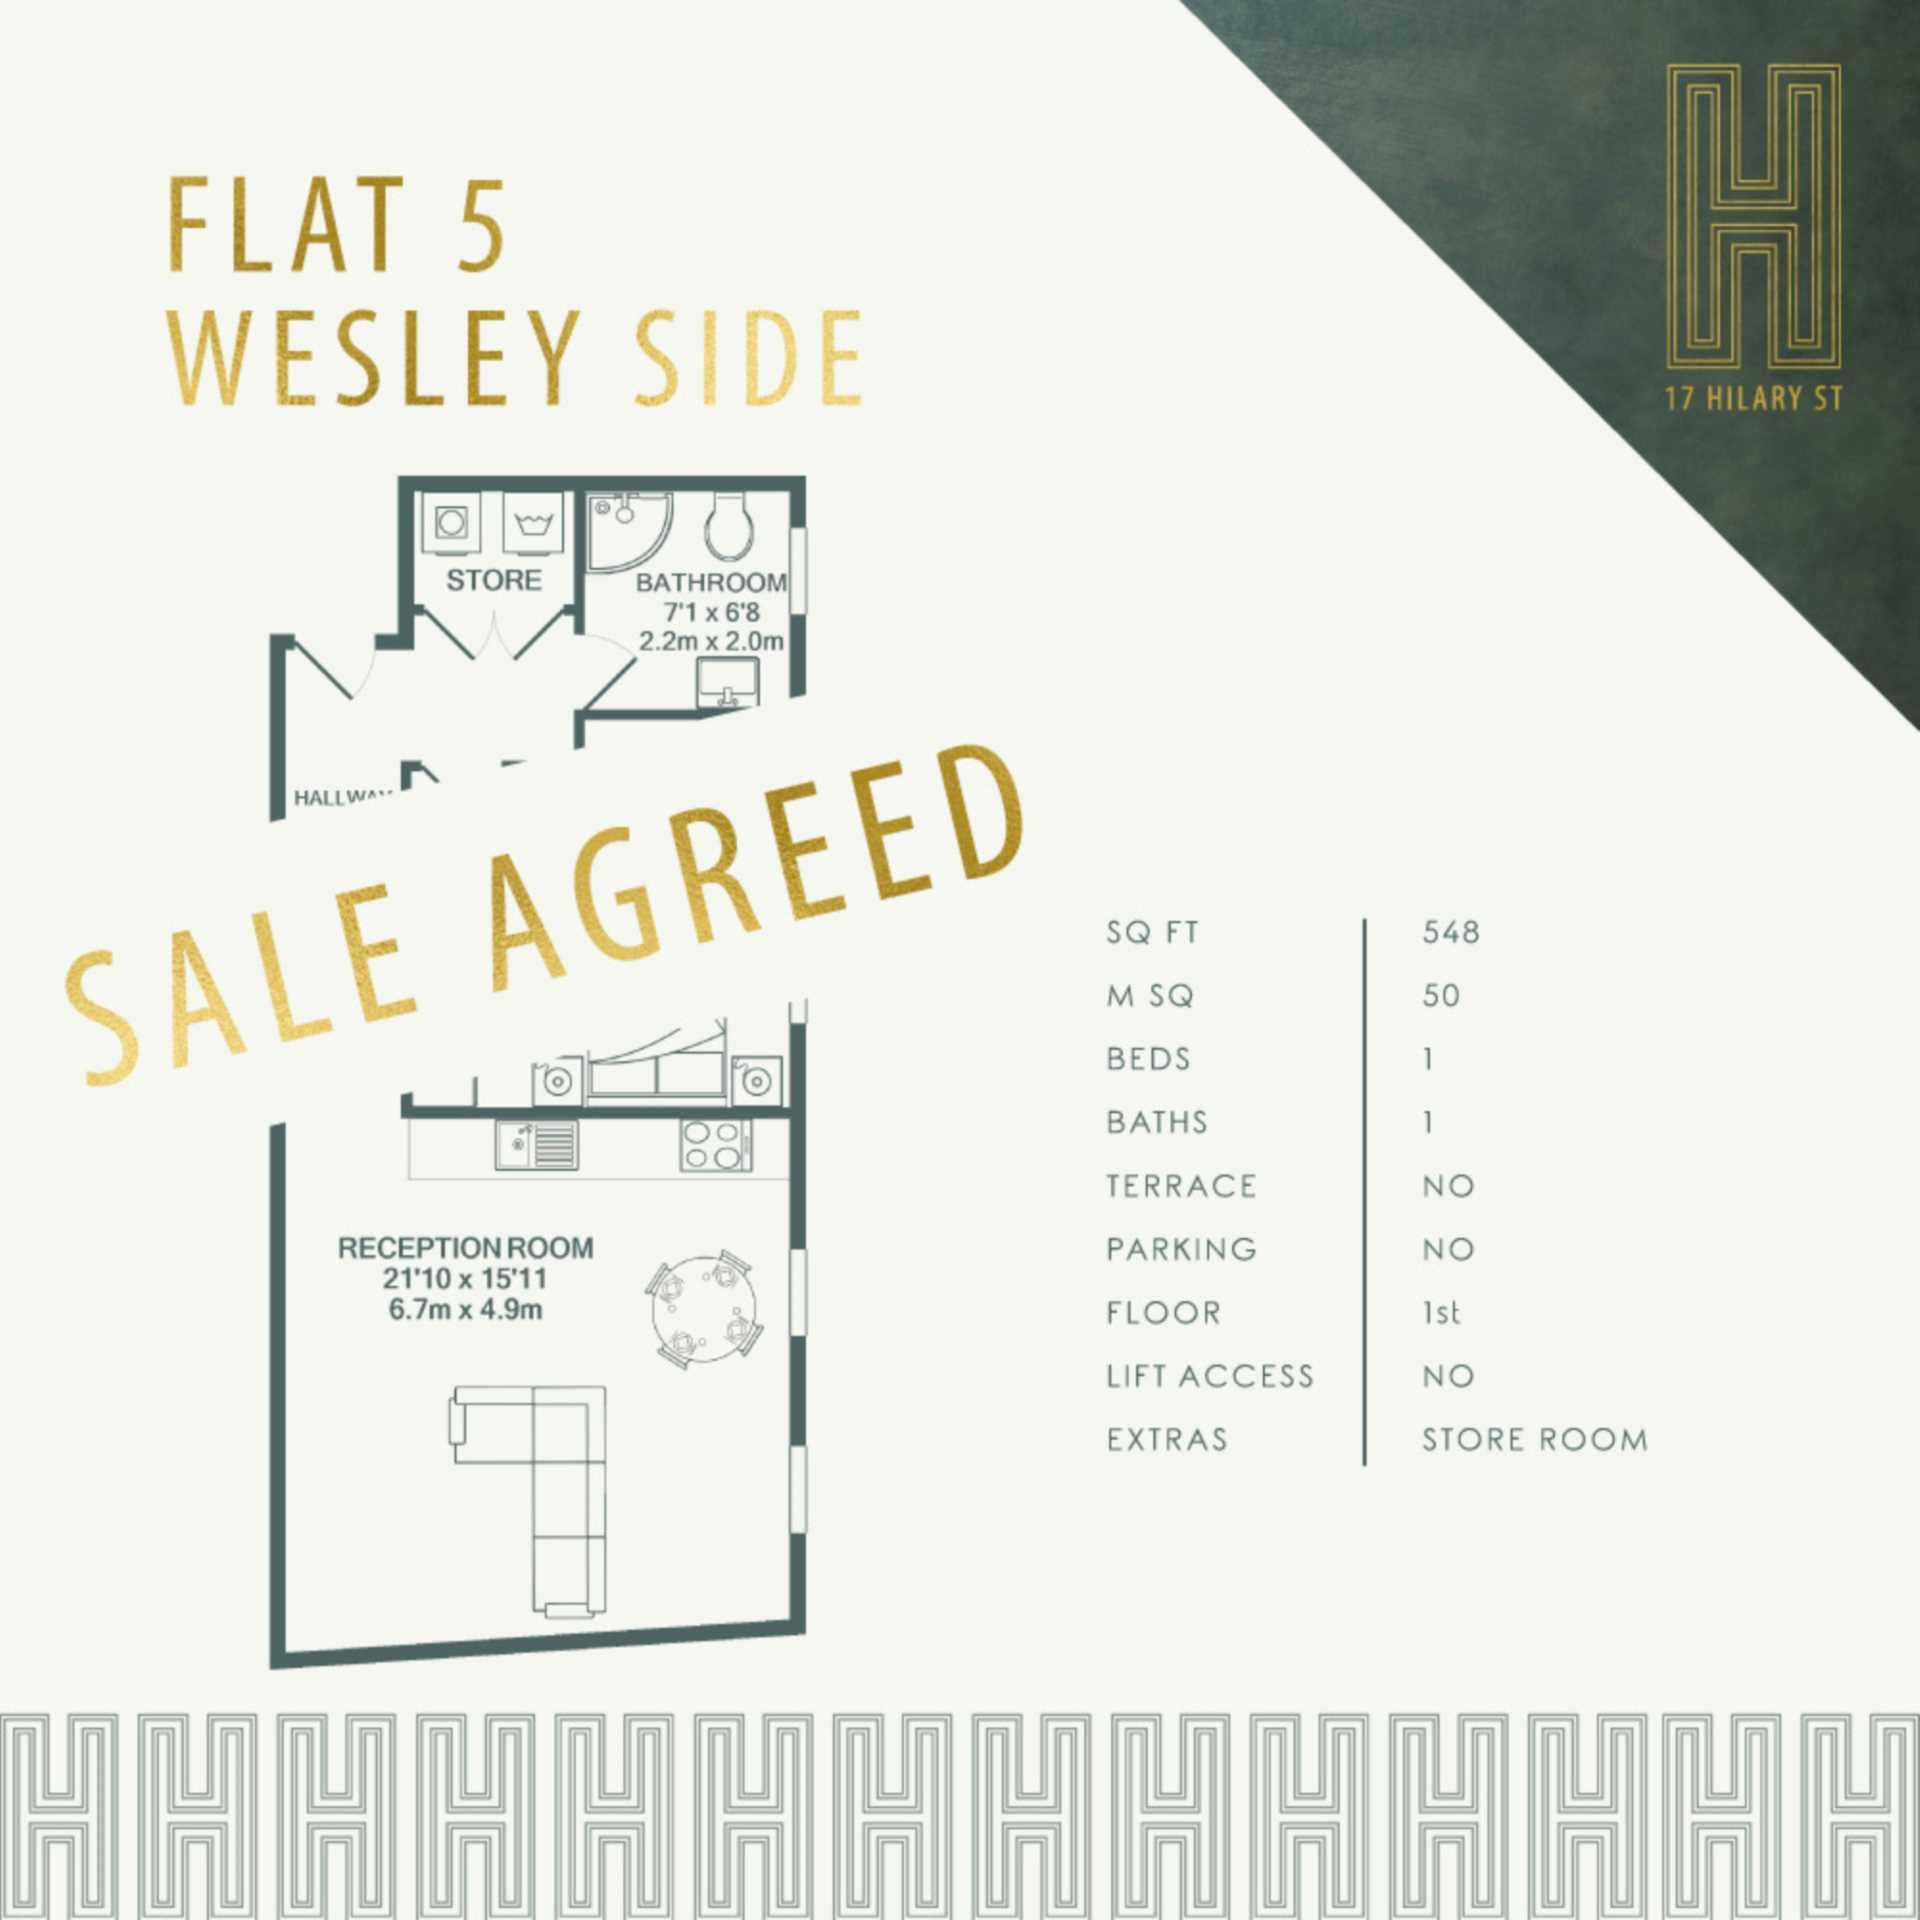 Flat 5, WS, 17 Hilary Street, Image 1